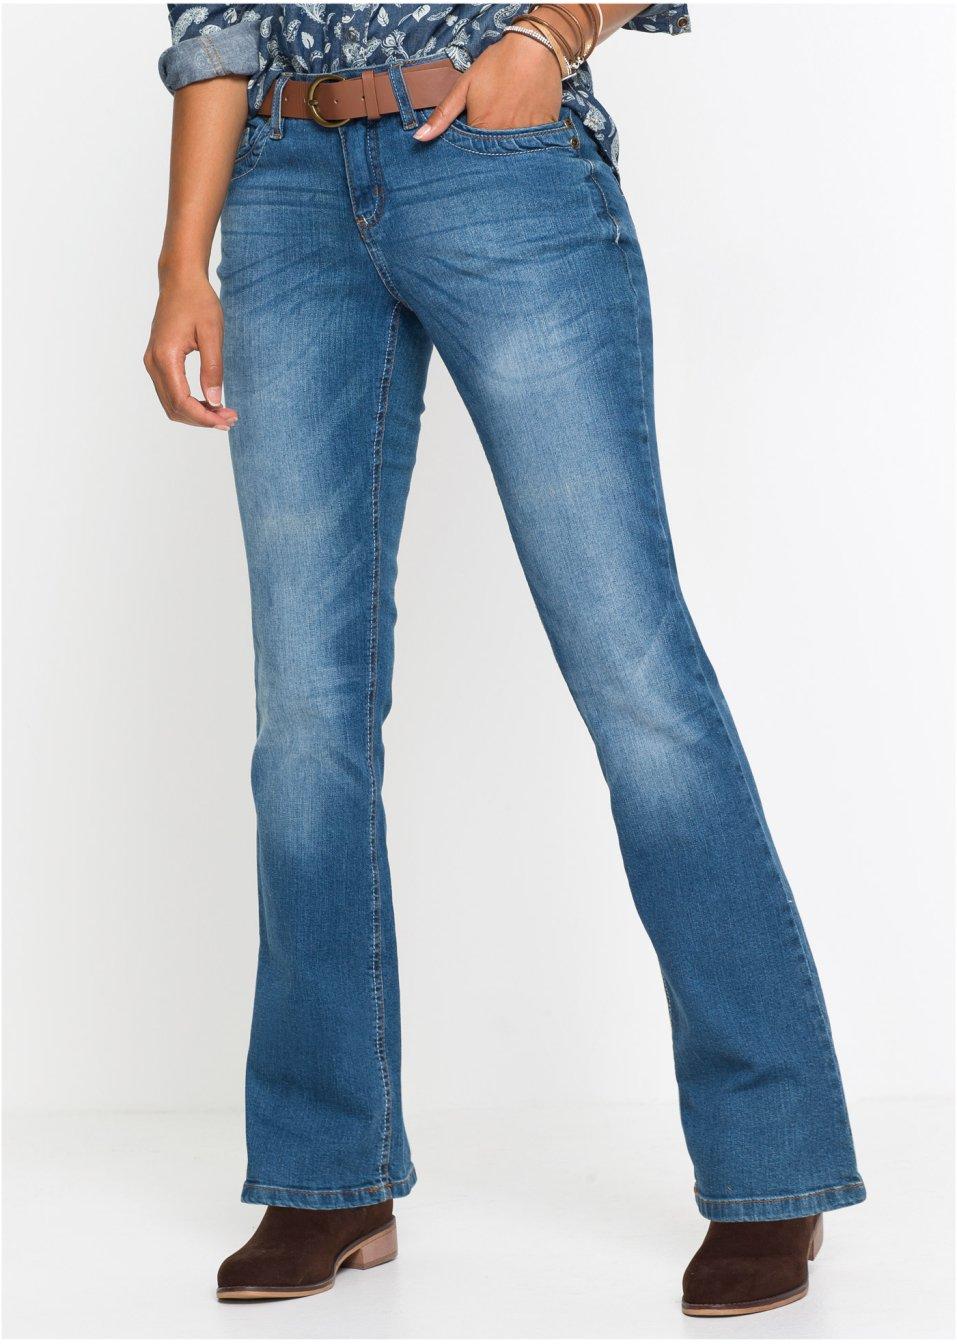 Strečové džíny s páskem BOOTCUT modrá - John Baner JEANSWEAR koupit online  - bonprix.cz 015a0a6fda